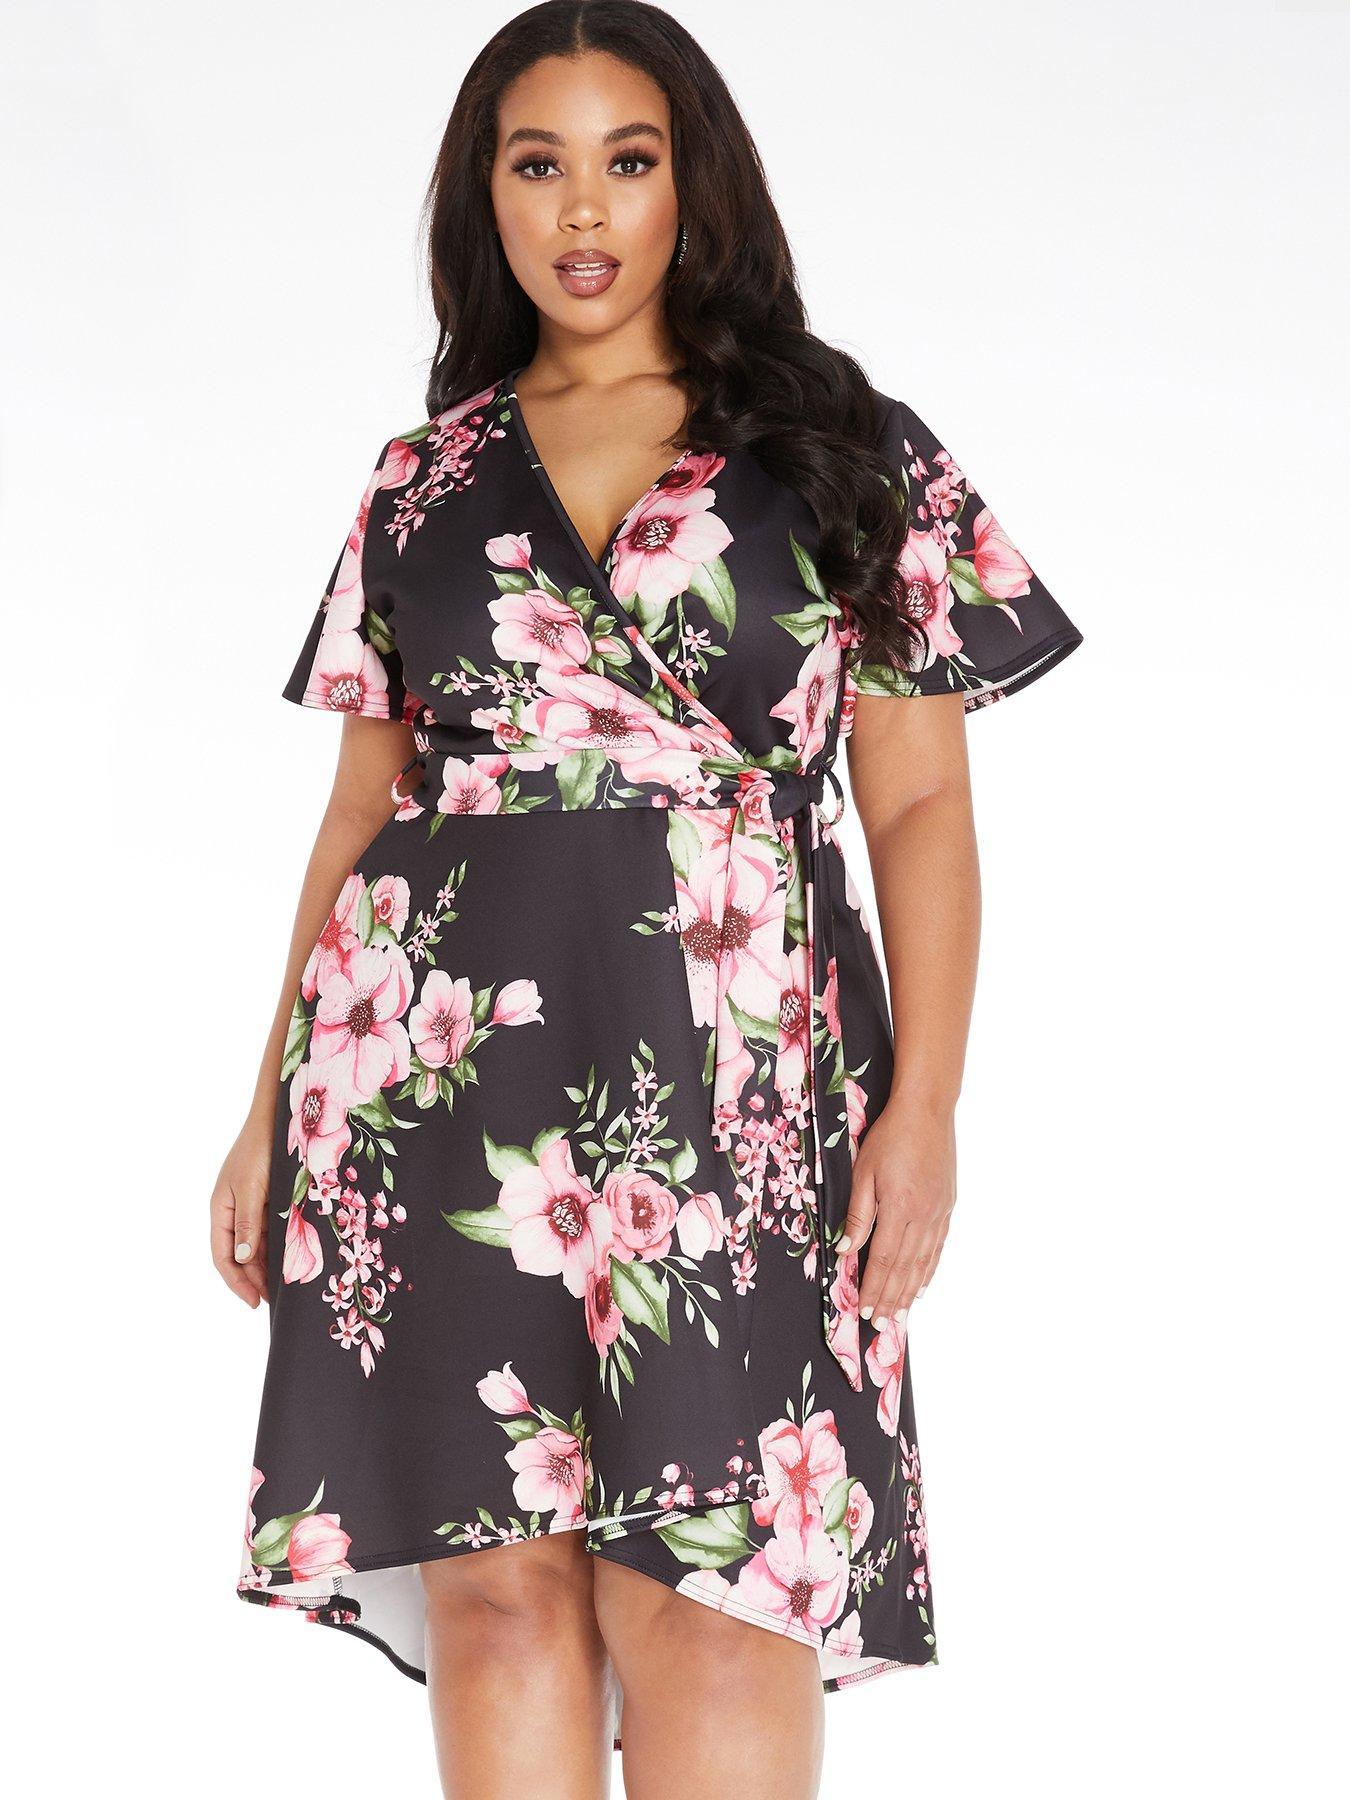 TOPSHOP New Black Pink Floral  Lace Up Tea Dress Size  6   RRP=£46